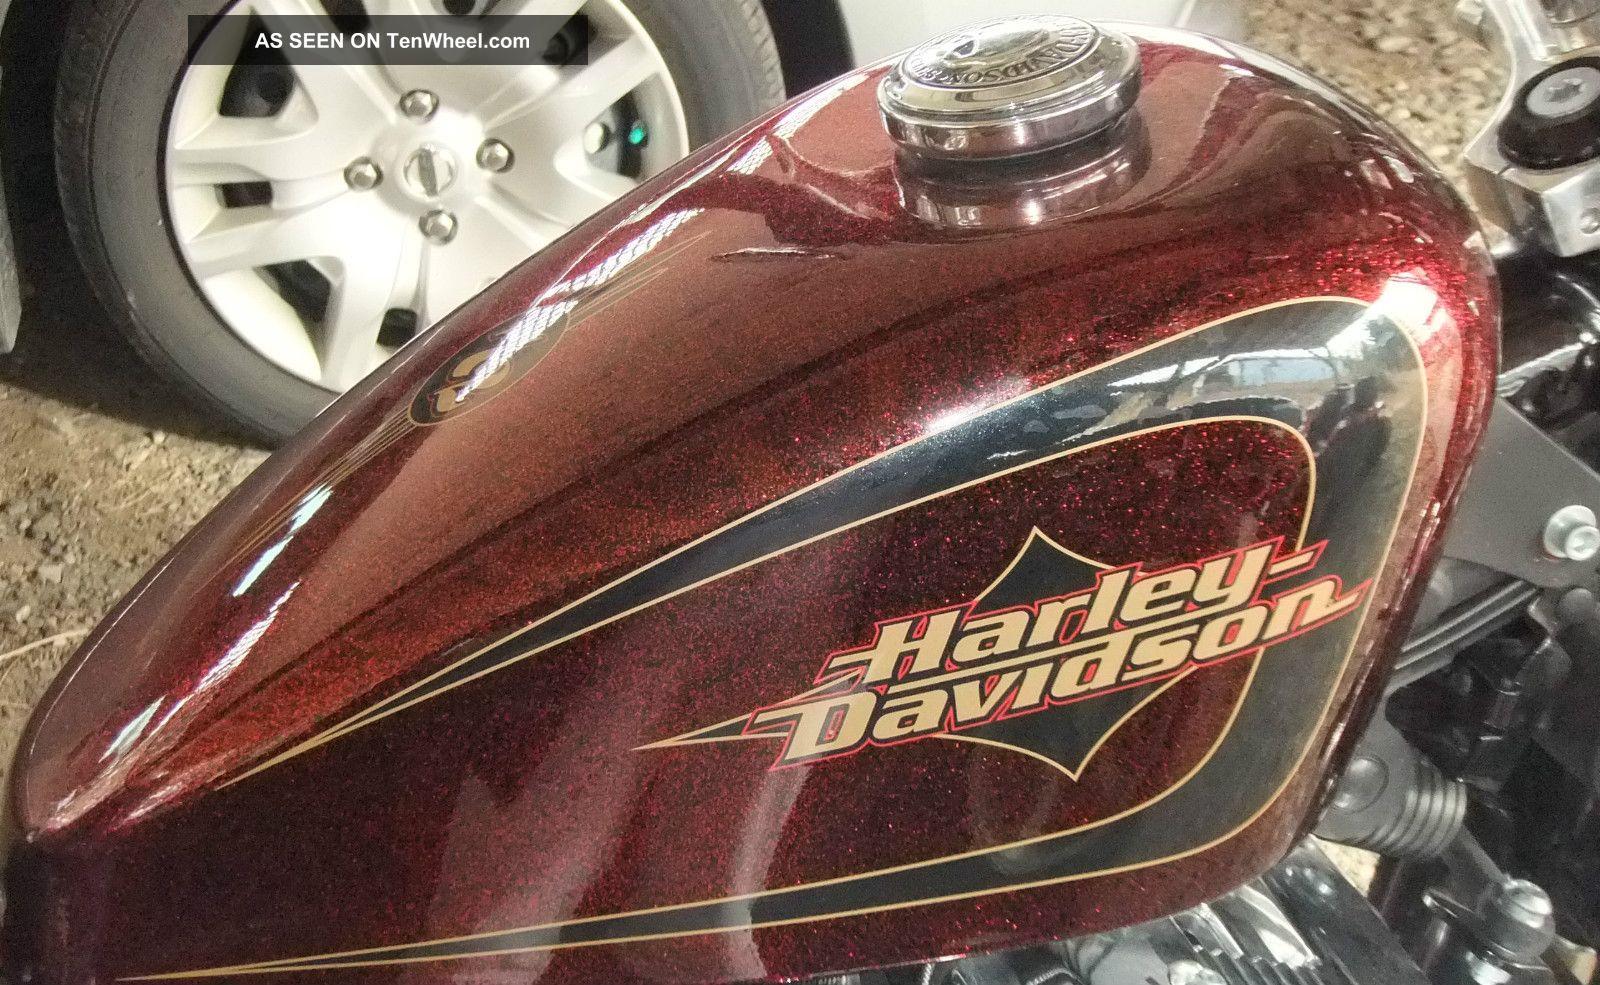 Green Metal Flake Harley Paint Www Picsbud Com